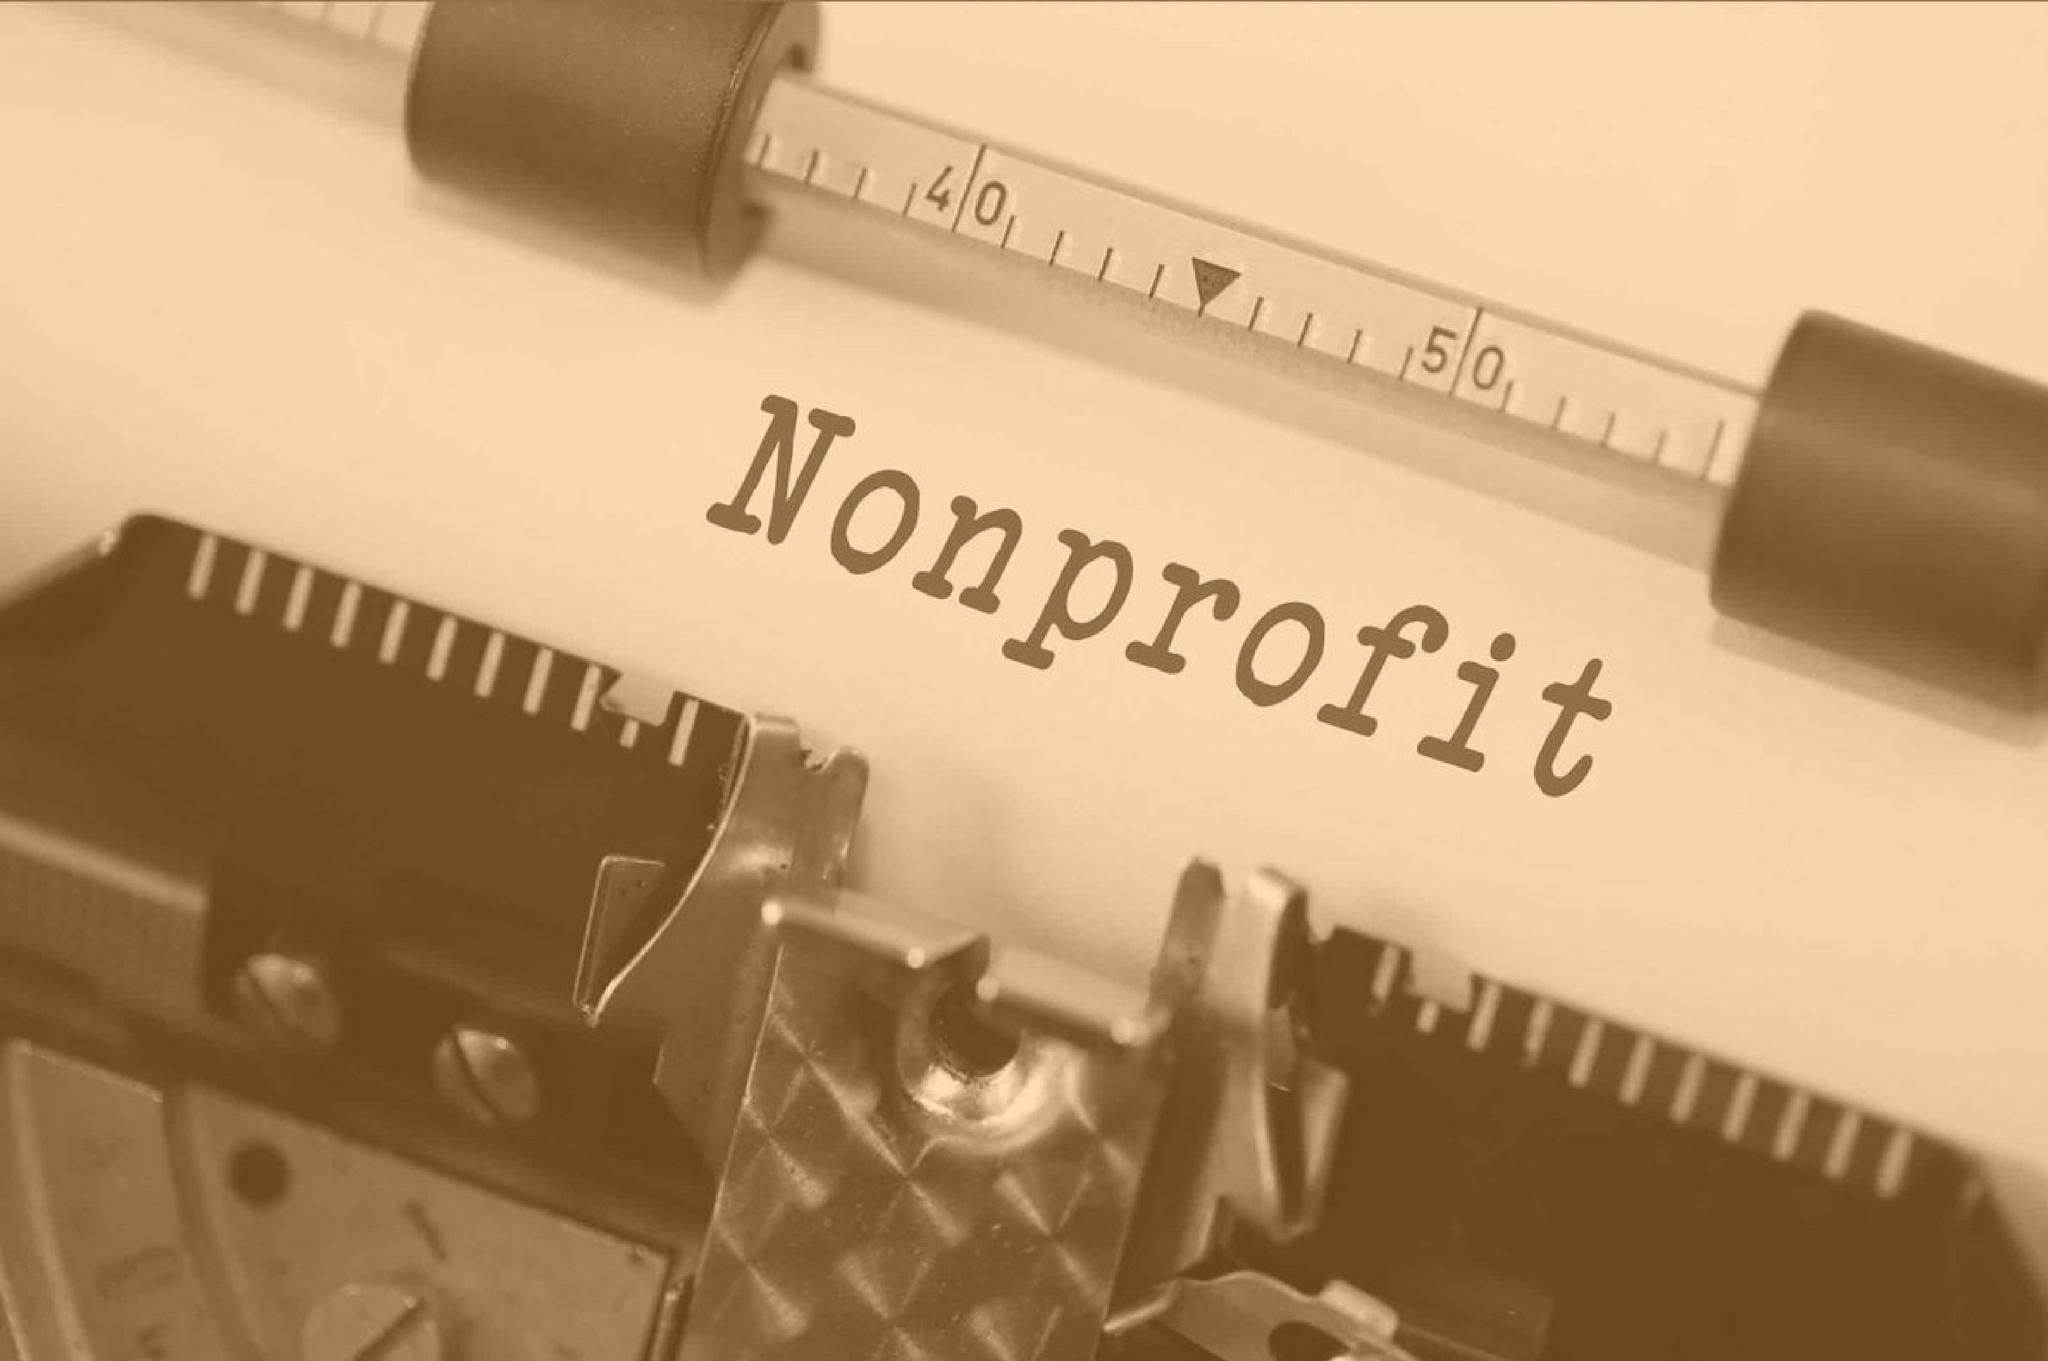 http://howmightwe.com/wp-content/uploads/2018/06/non-profit.jpg